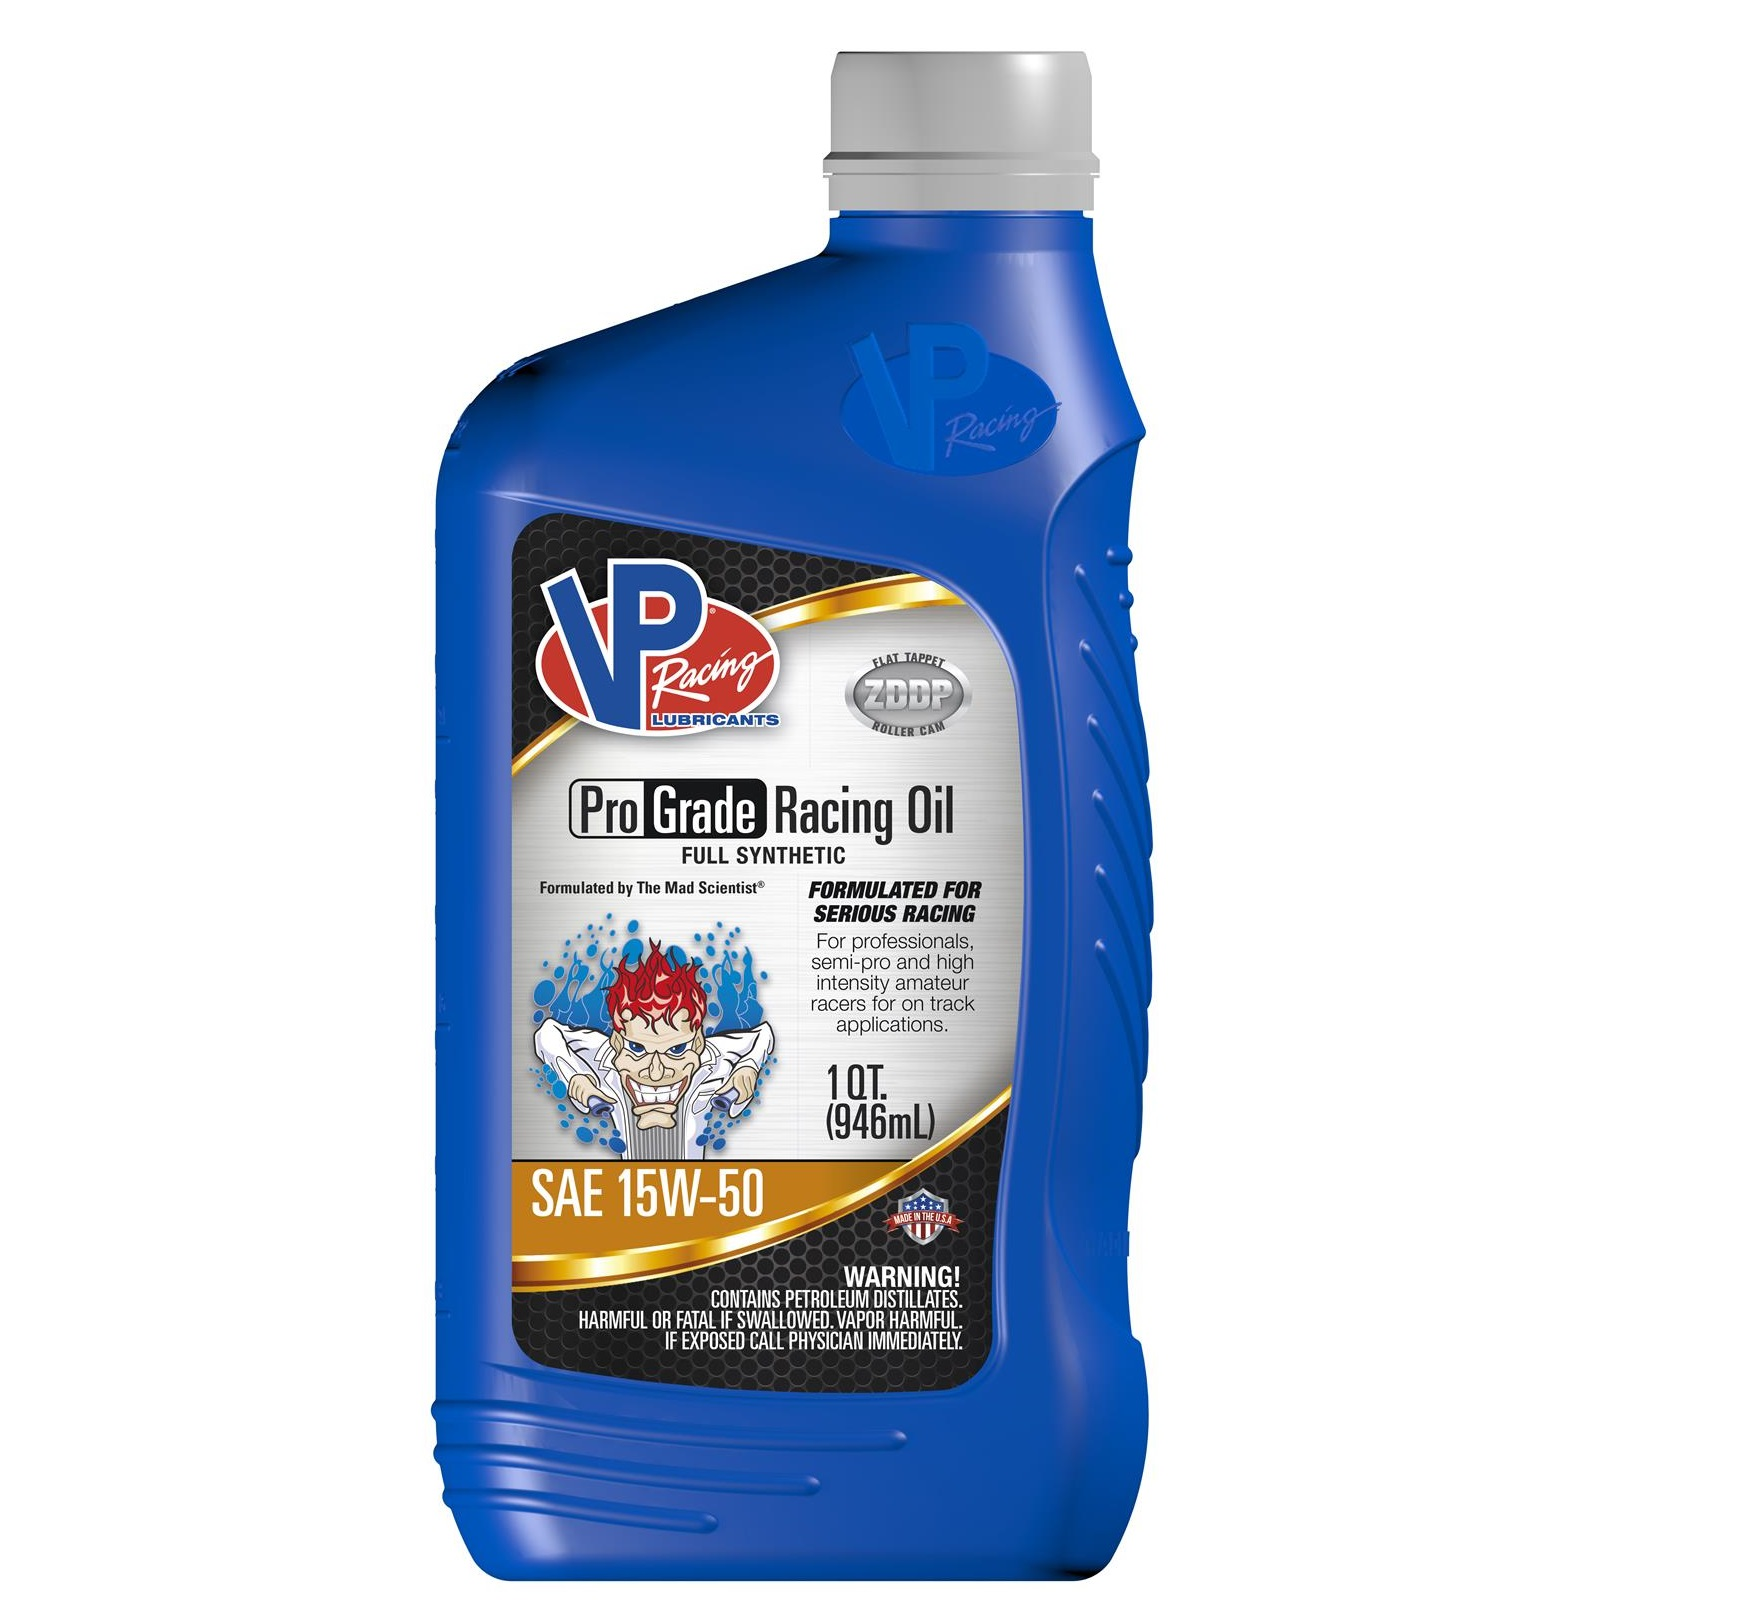 VP Racing Fuel Full SYN 15W-50 Pro Grade Racing Oil QUART